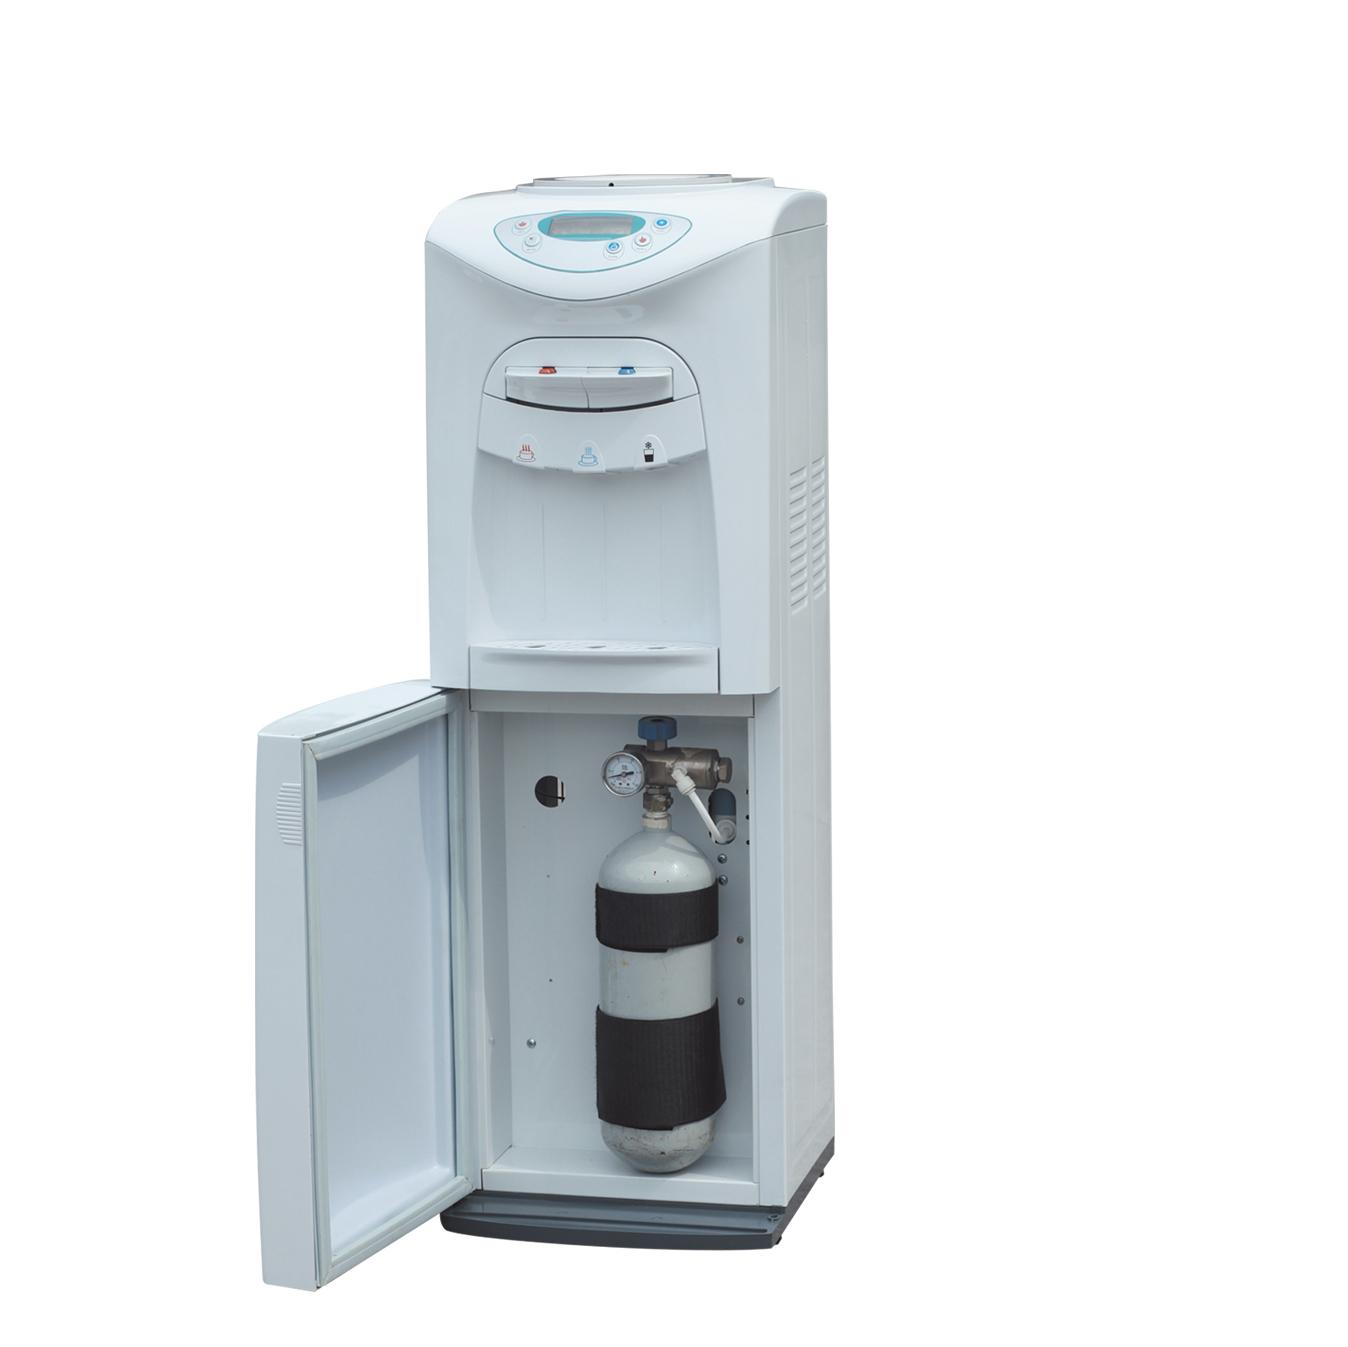 Sparkling water dispenser, water dispenser with carbonator